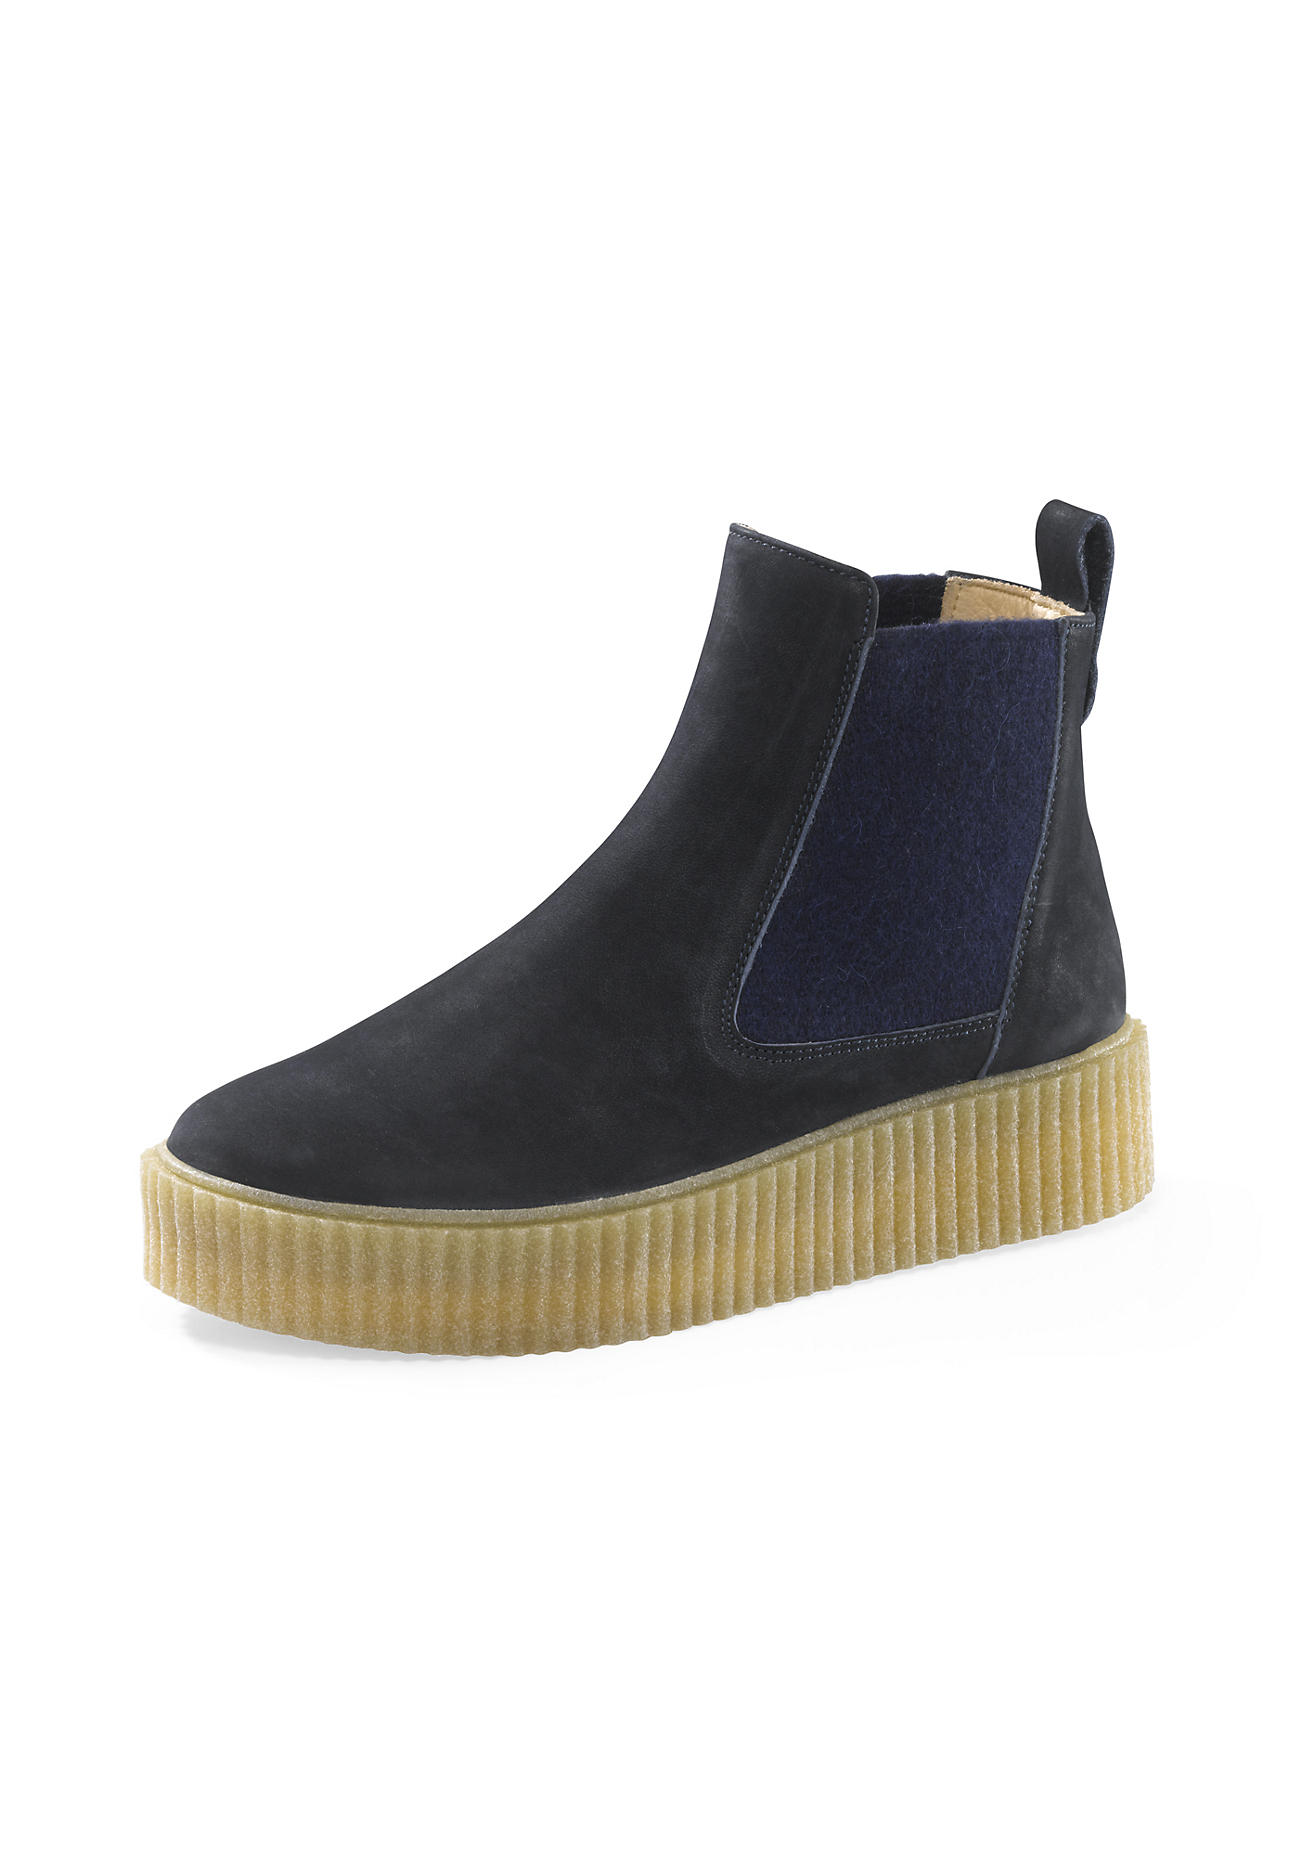 hessnatur Damen Damen Chelsea Boots aus Leder – blau – Größe 36